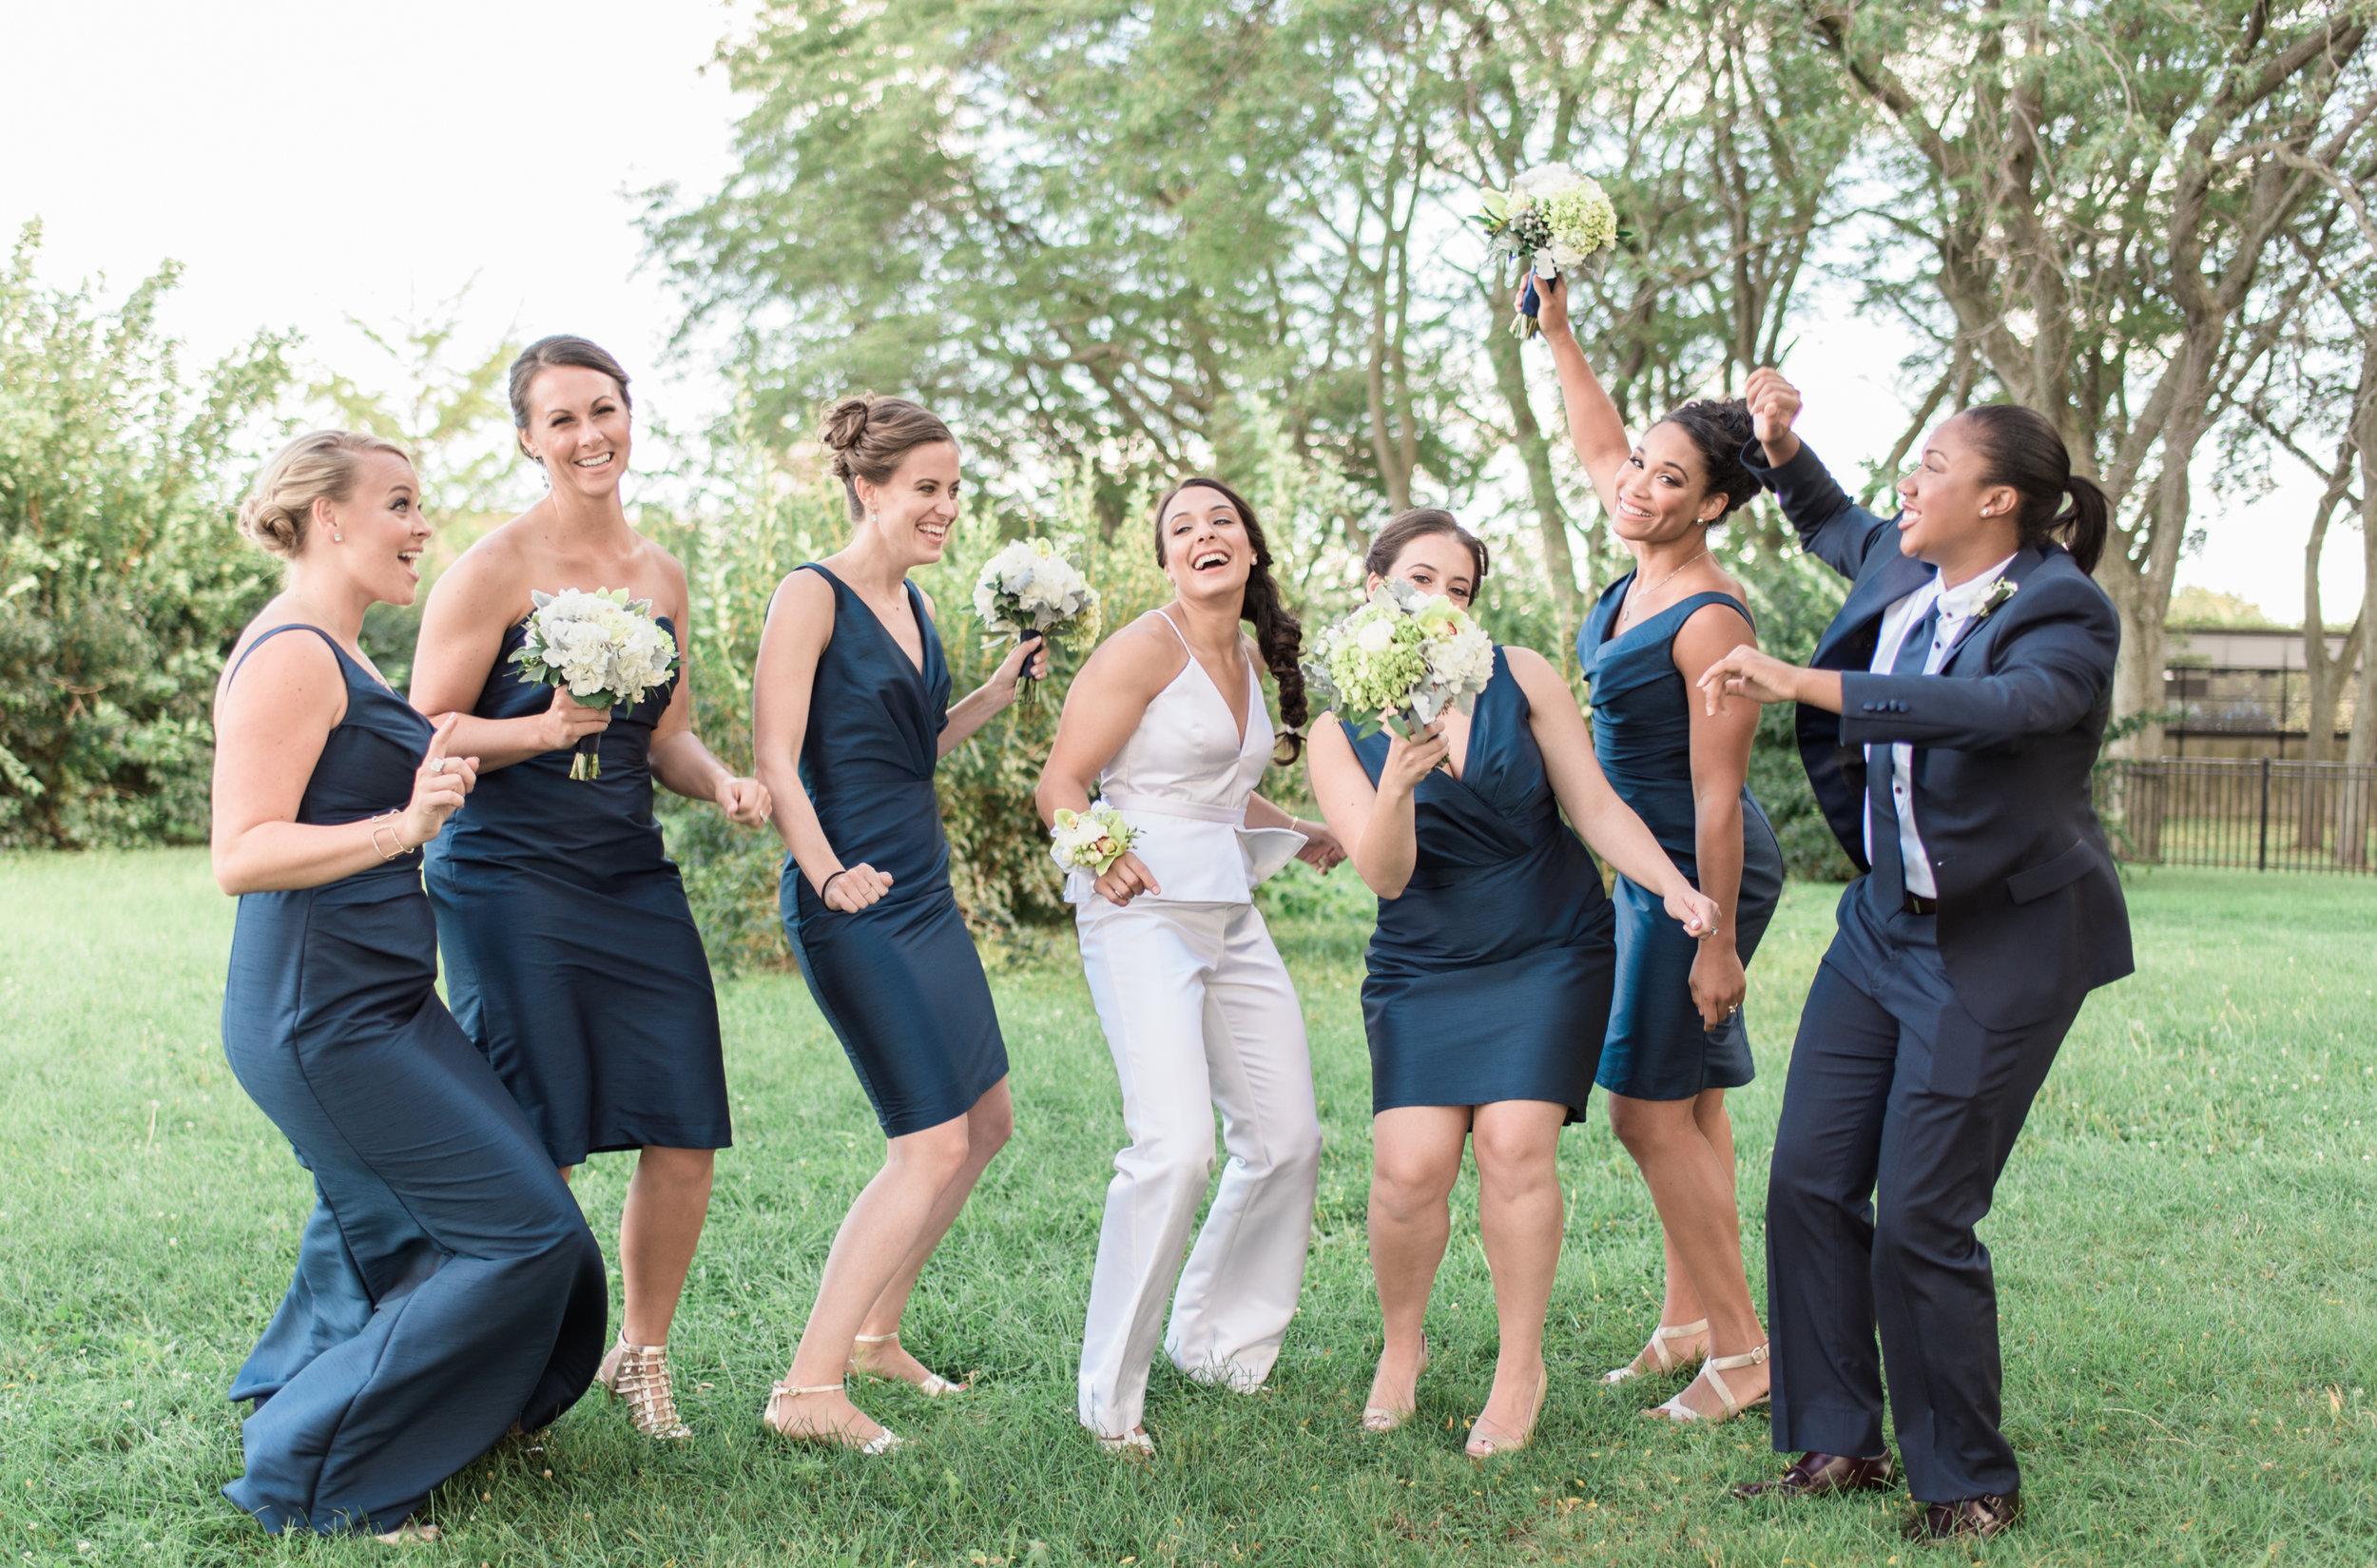 Bonphotage Wedding Photography - Milton Lee Olive Park